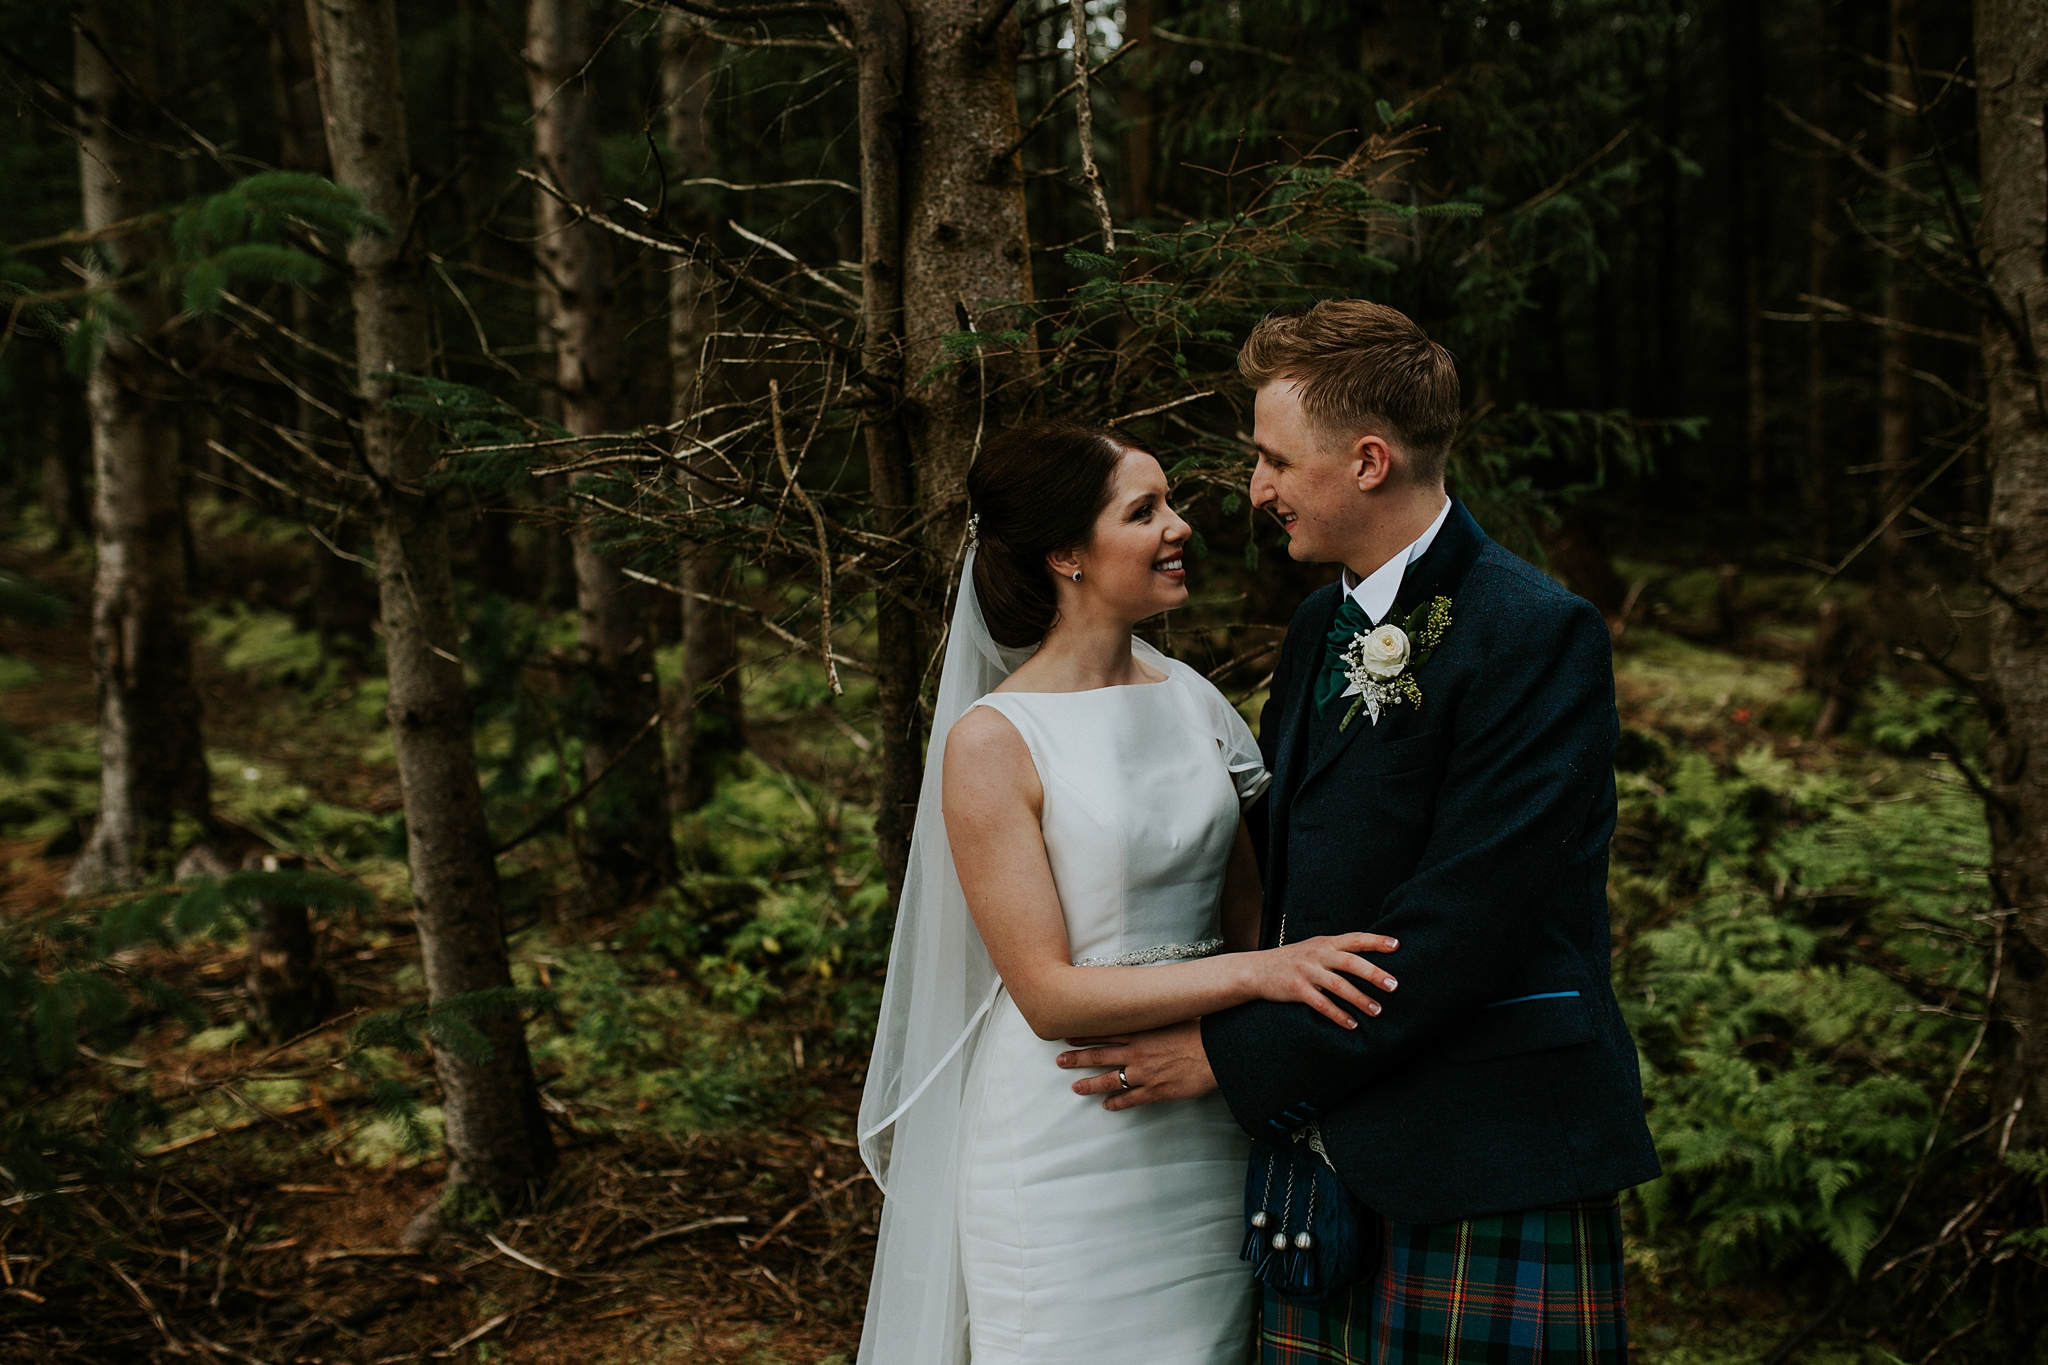 Linda&Shockie_northuist_wedding_photographer-48.JPG